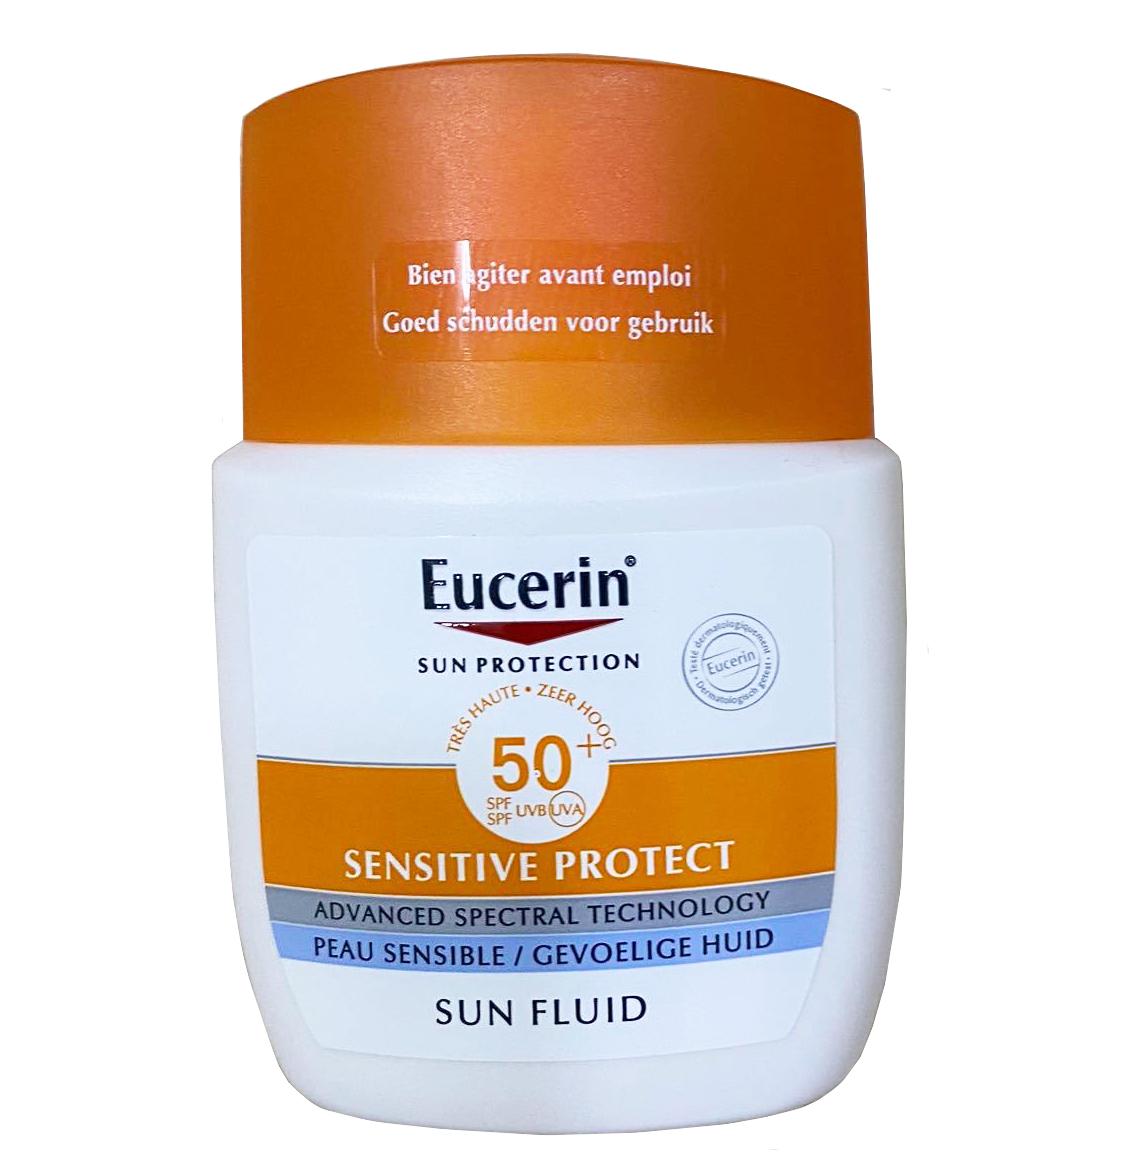 Kem chống nắng Eucerin Face Sun Fluid SPF 50+